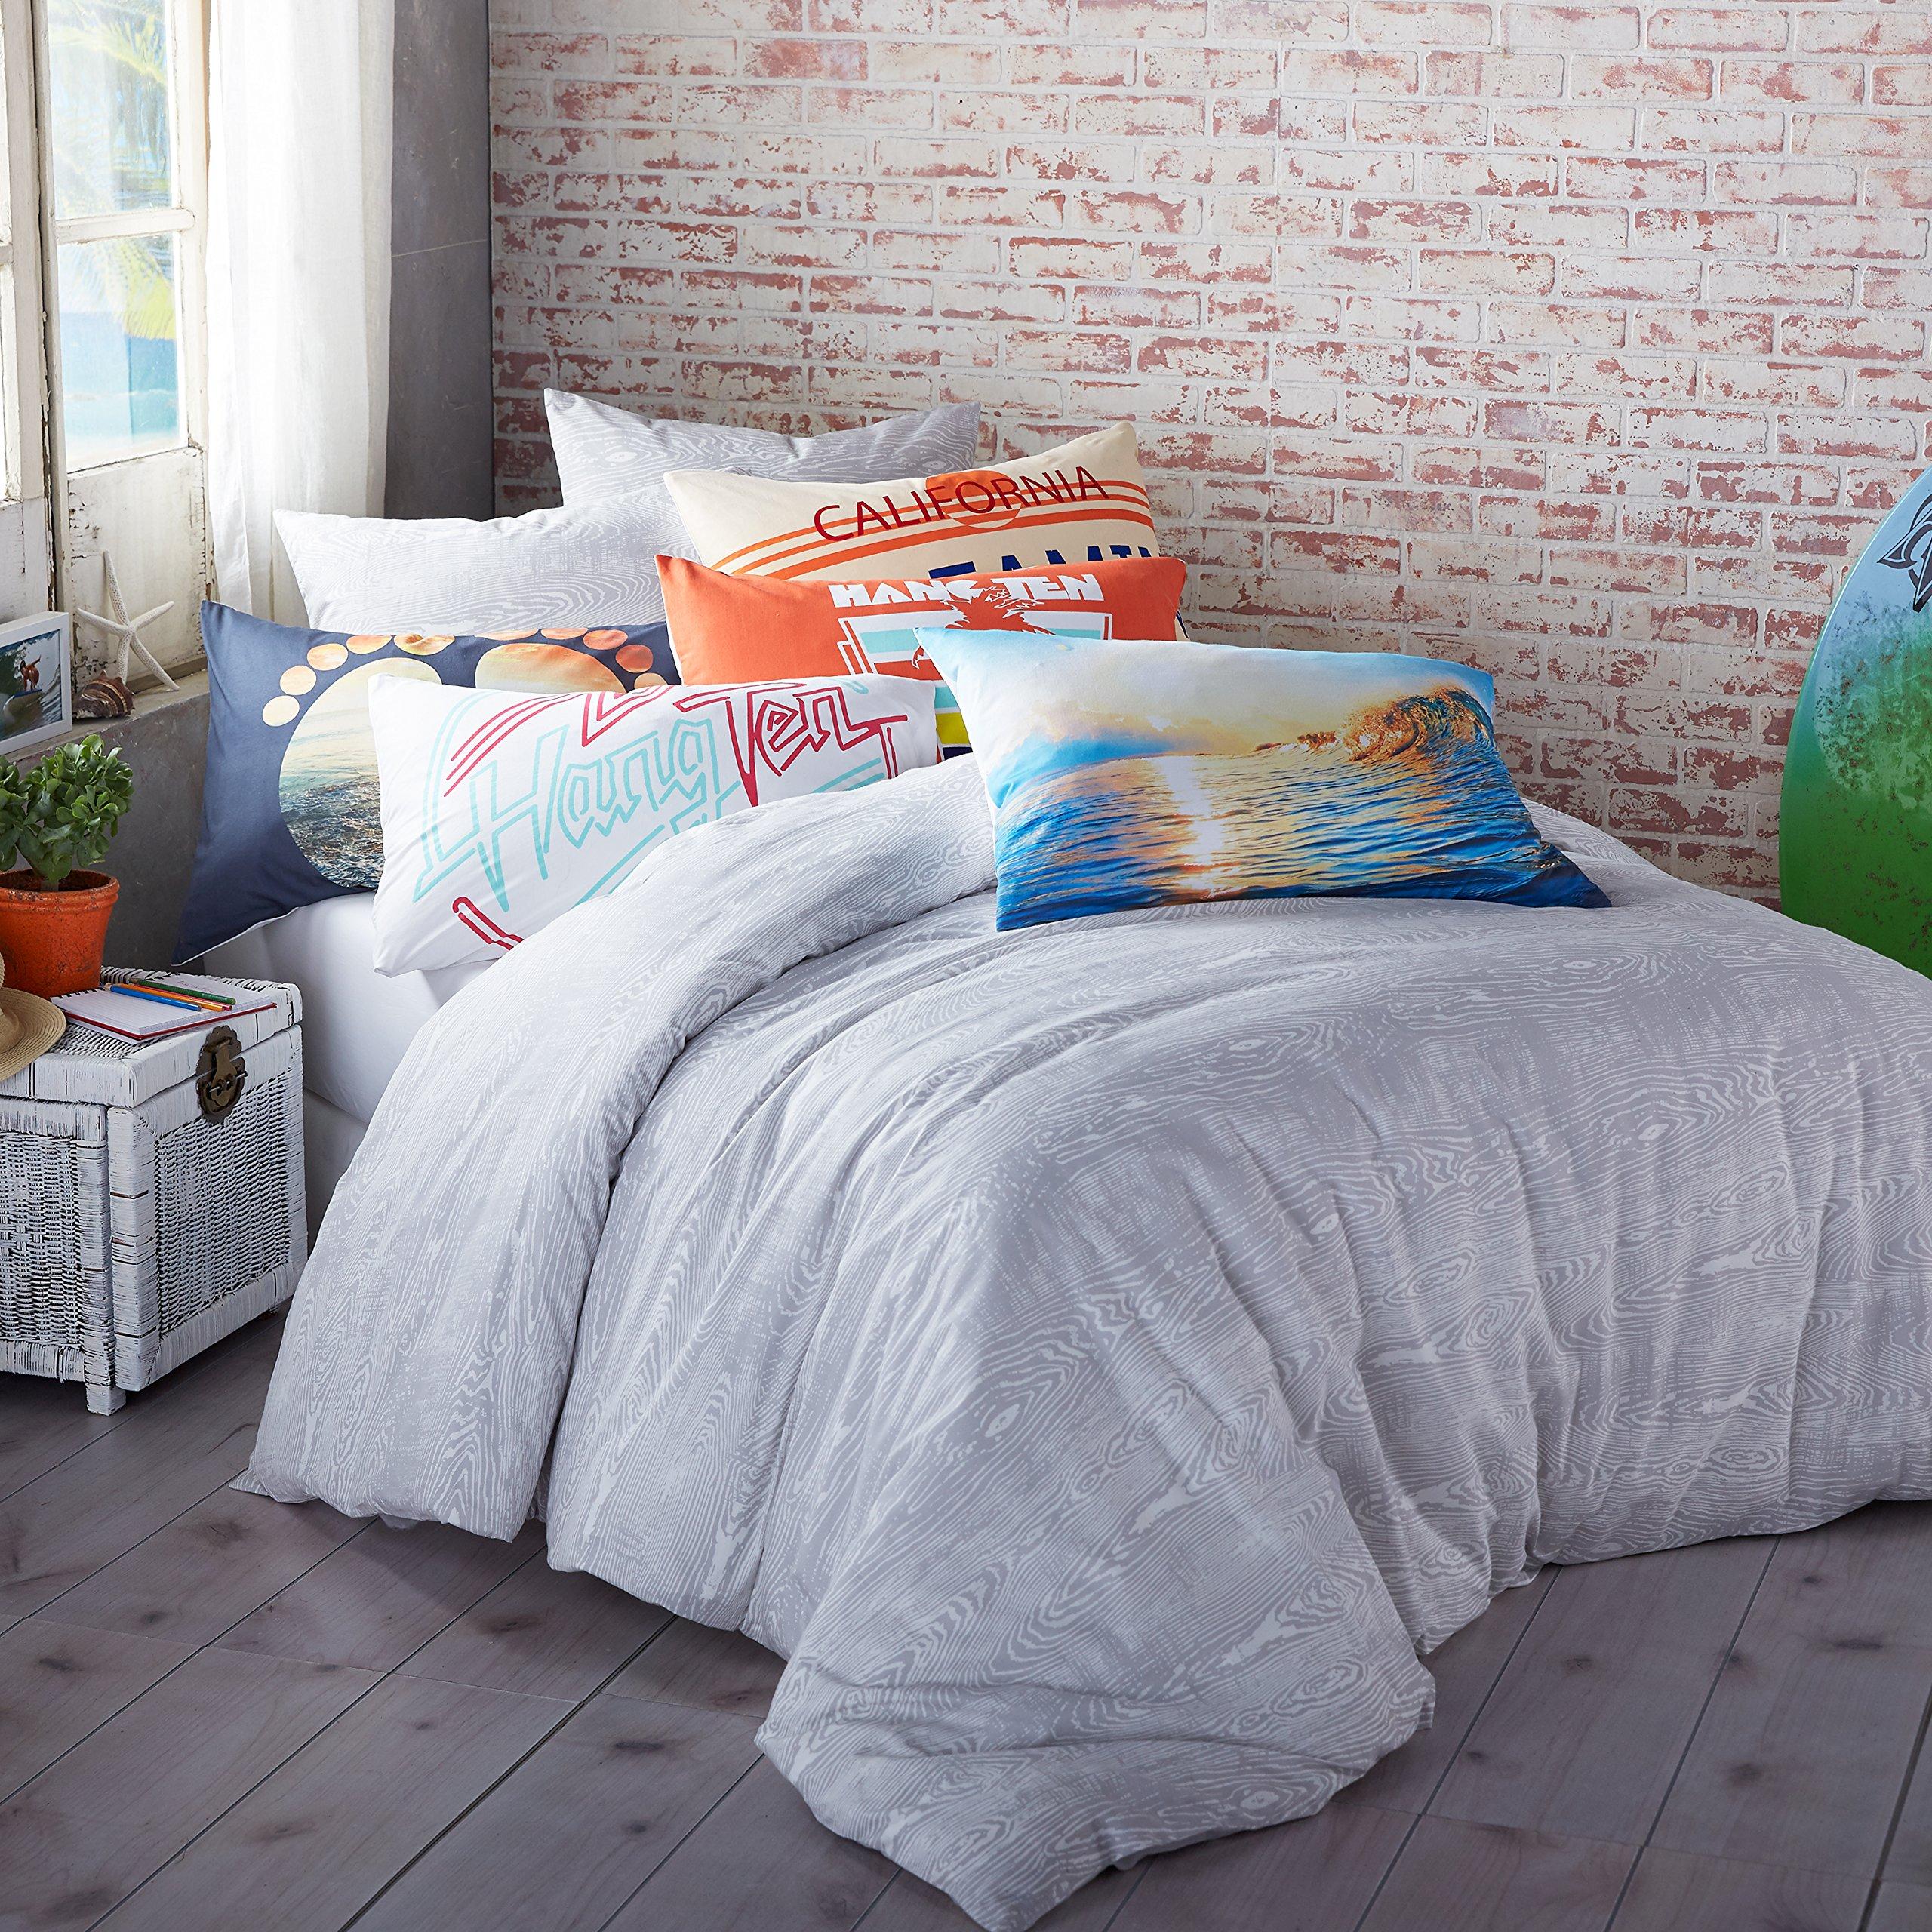 Hang Ten Woodgrain Reversible Cotton Duvet Cover Set, Grey, Twin